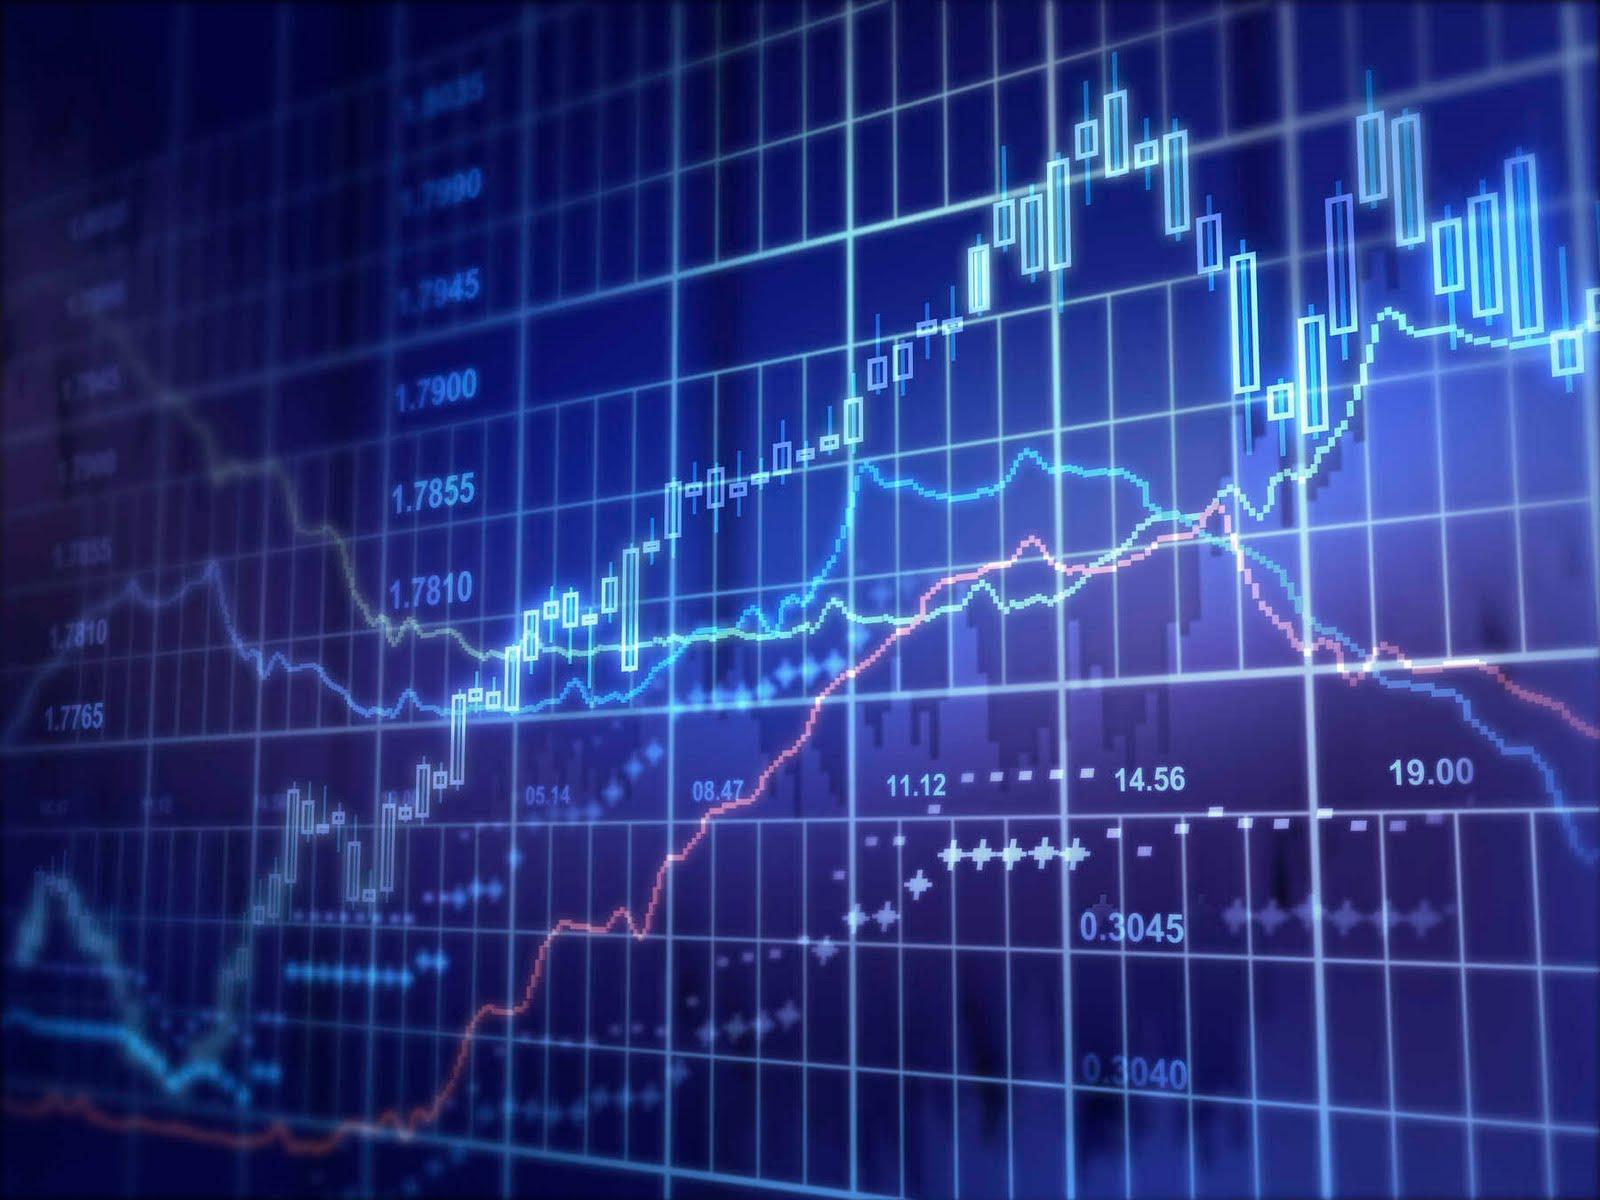 Анализ цен BTC, ETH, XRP (06.10.21)